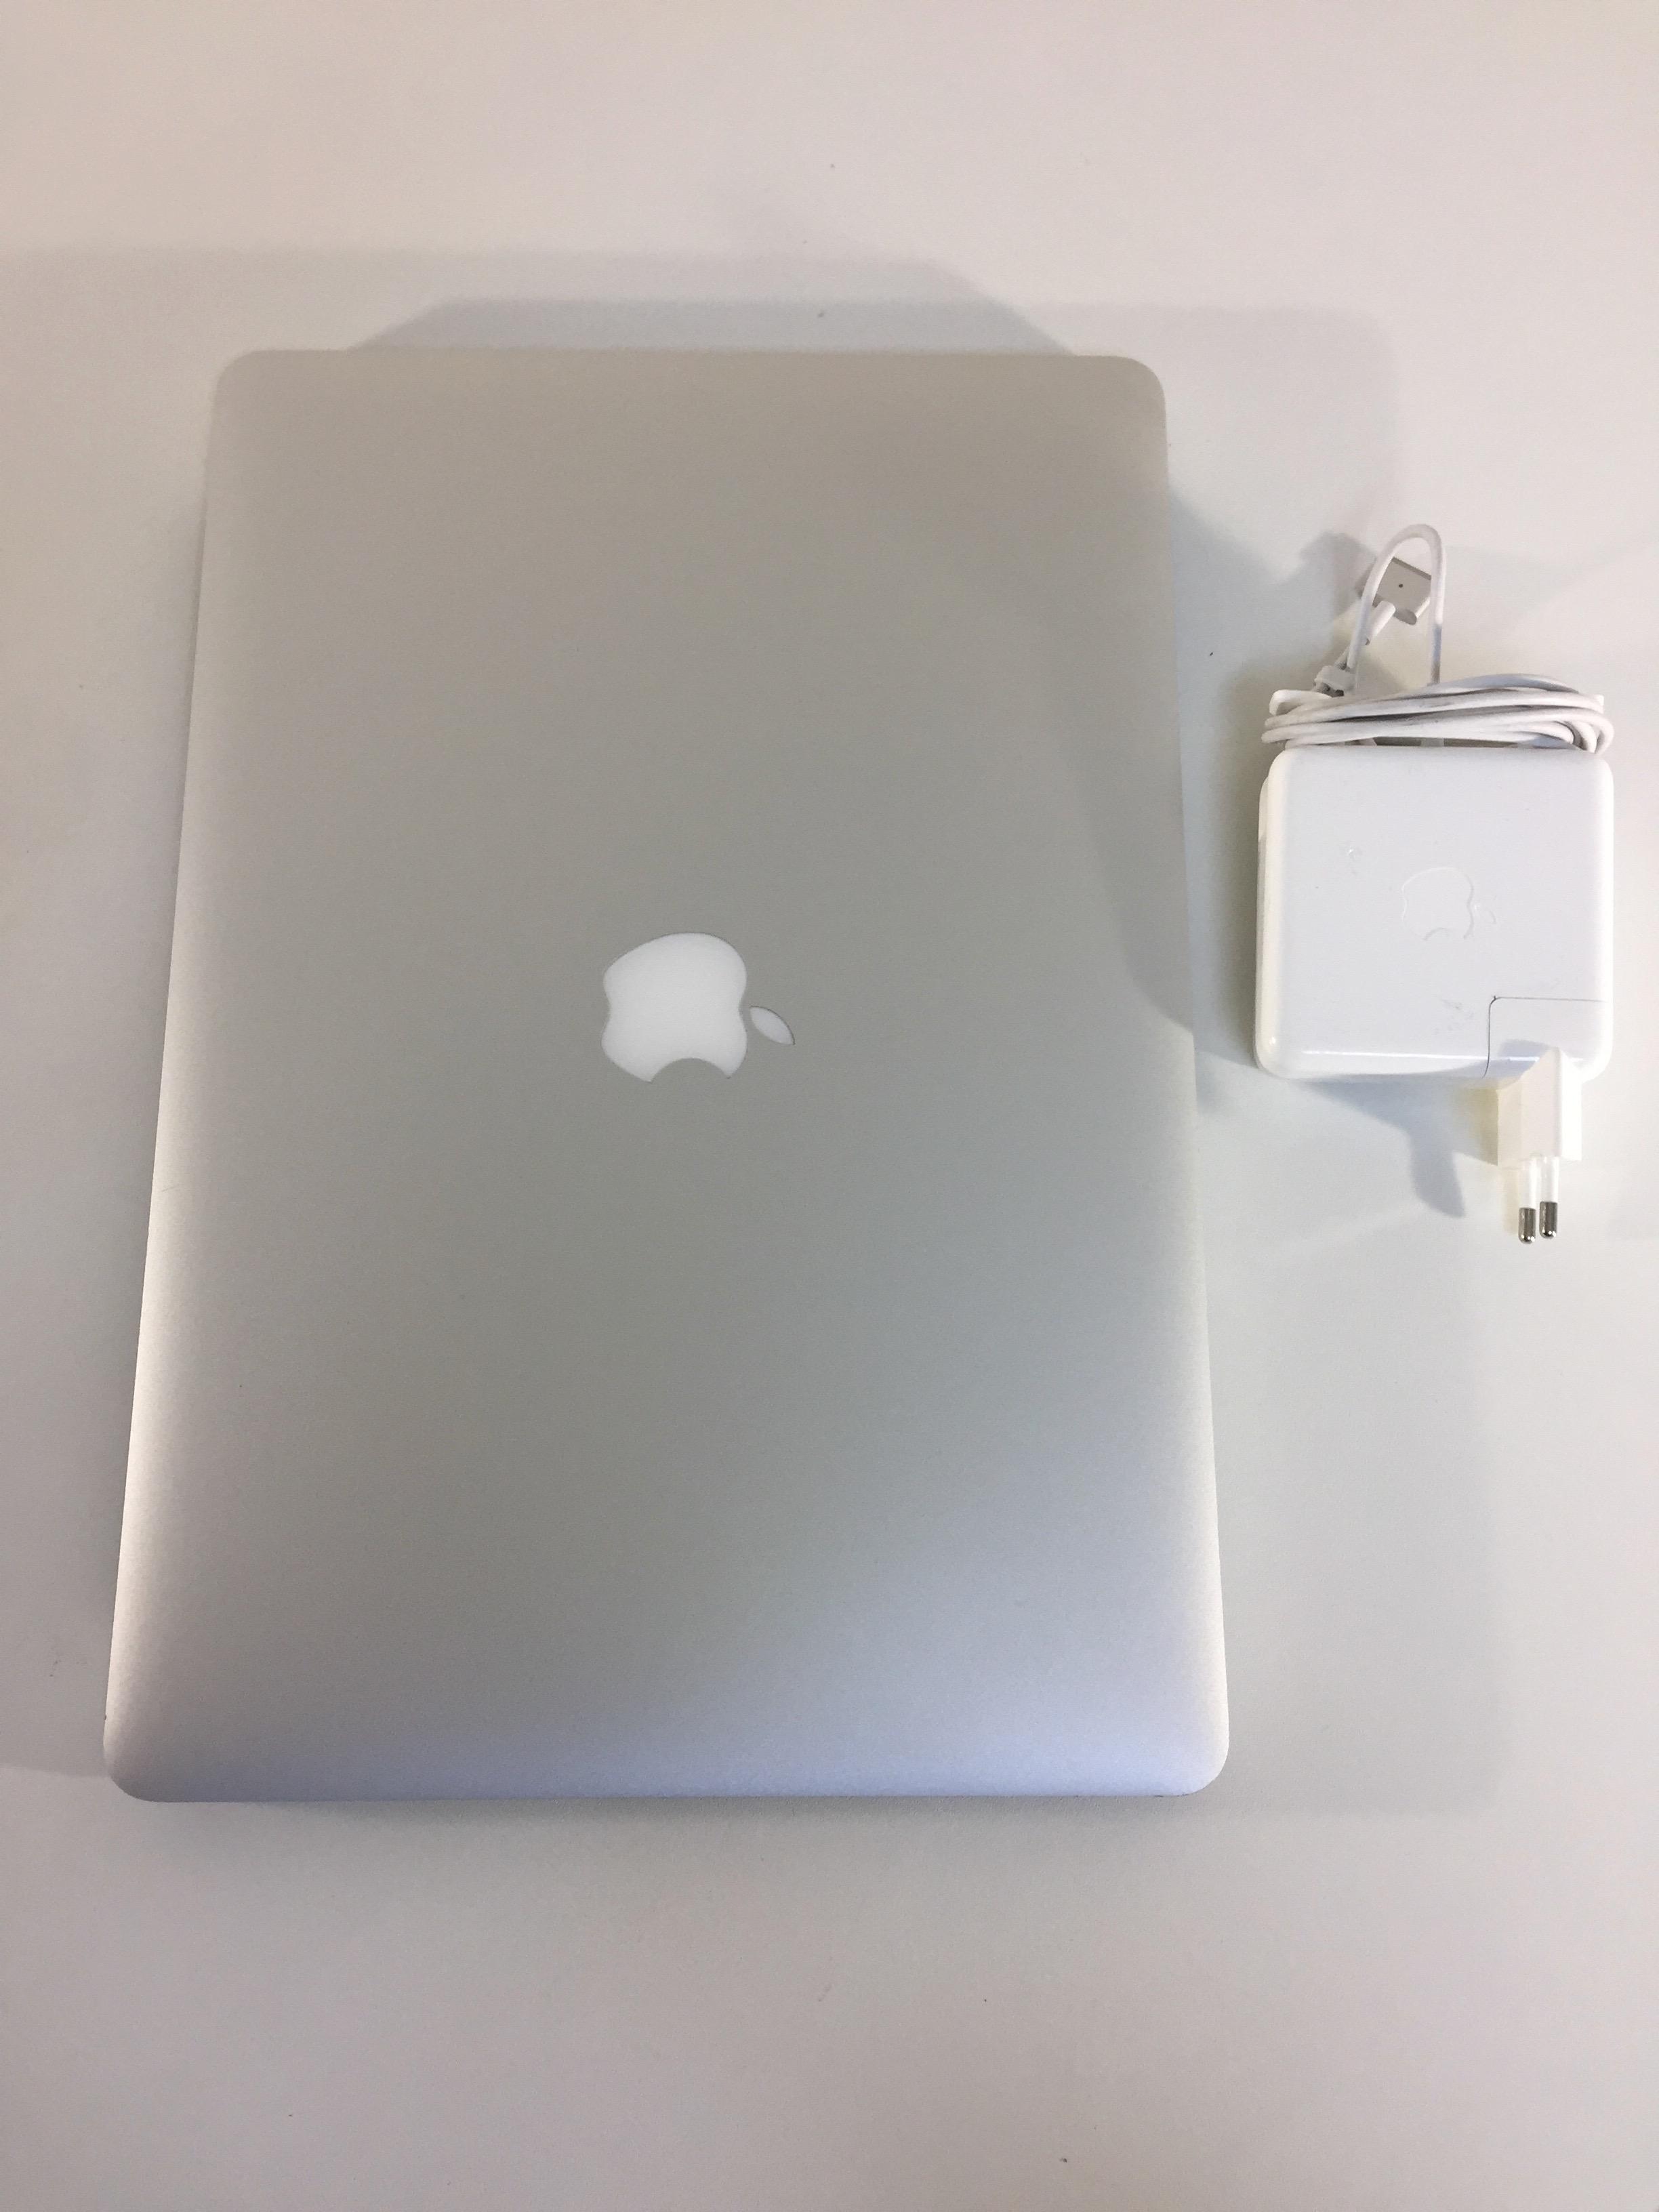 MacBook Pro 15-inch Retina, 2.0 GHz Quad-Core i7, 16 GB, 256 GB Flash, Bild 2